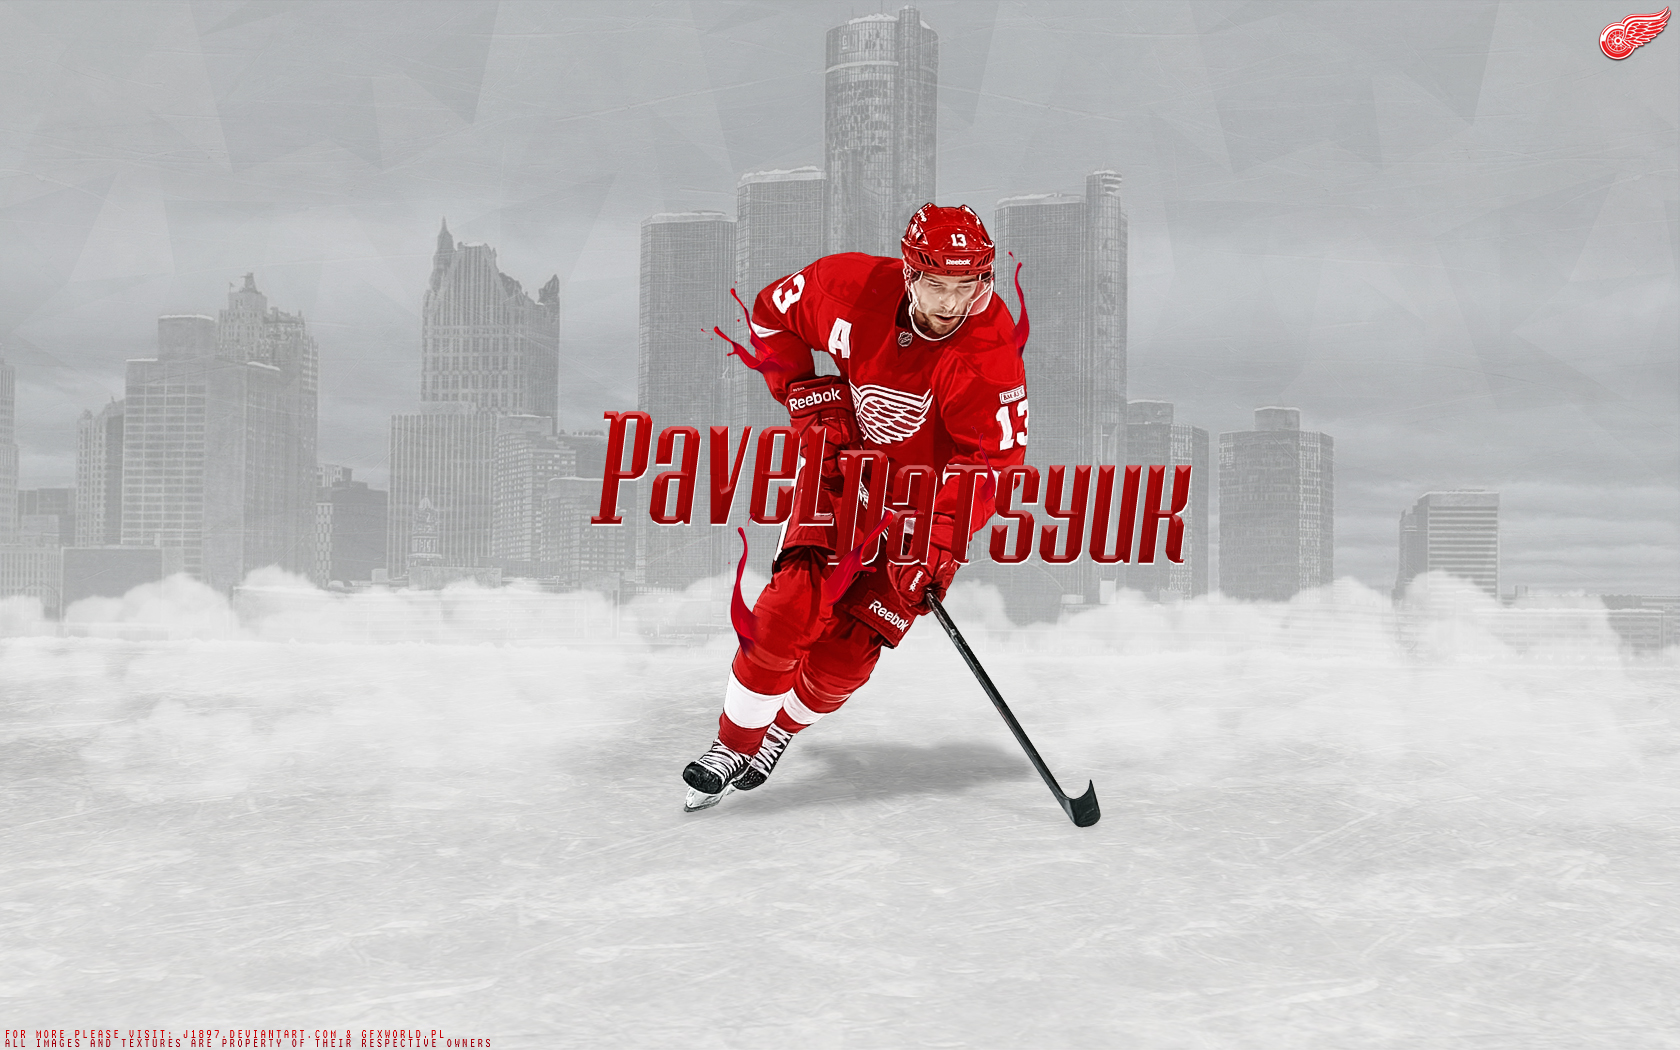 Best 49 Pavel Datsyuk Wallpaper on HipWallpaper Pavel Datyuk 1680x1050